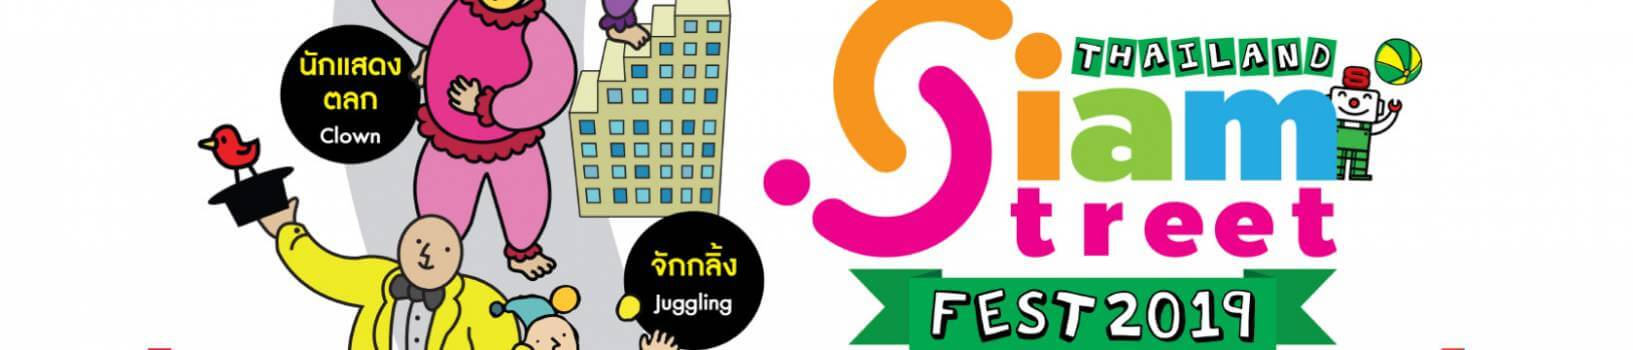 Thailand Siam Street Fest 2019